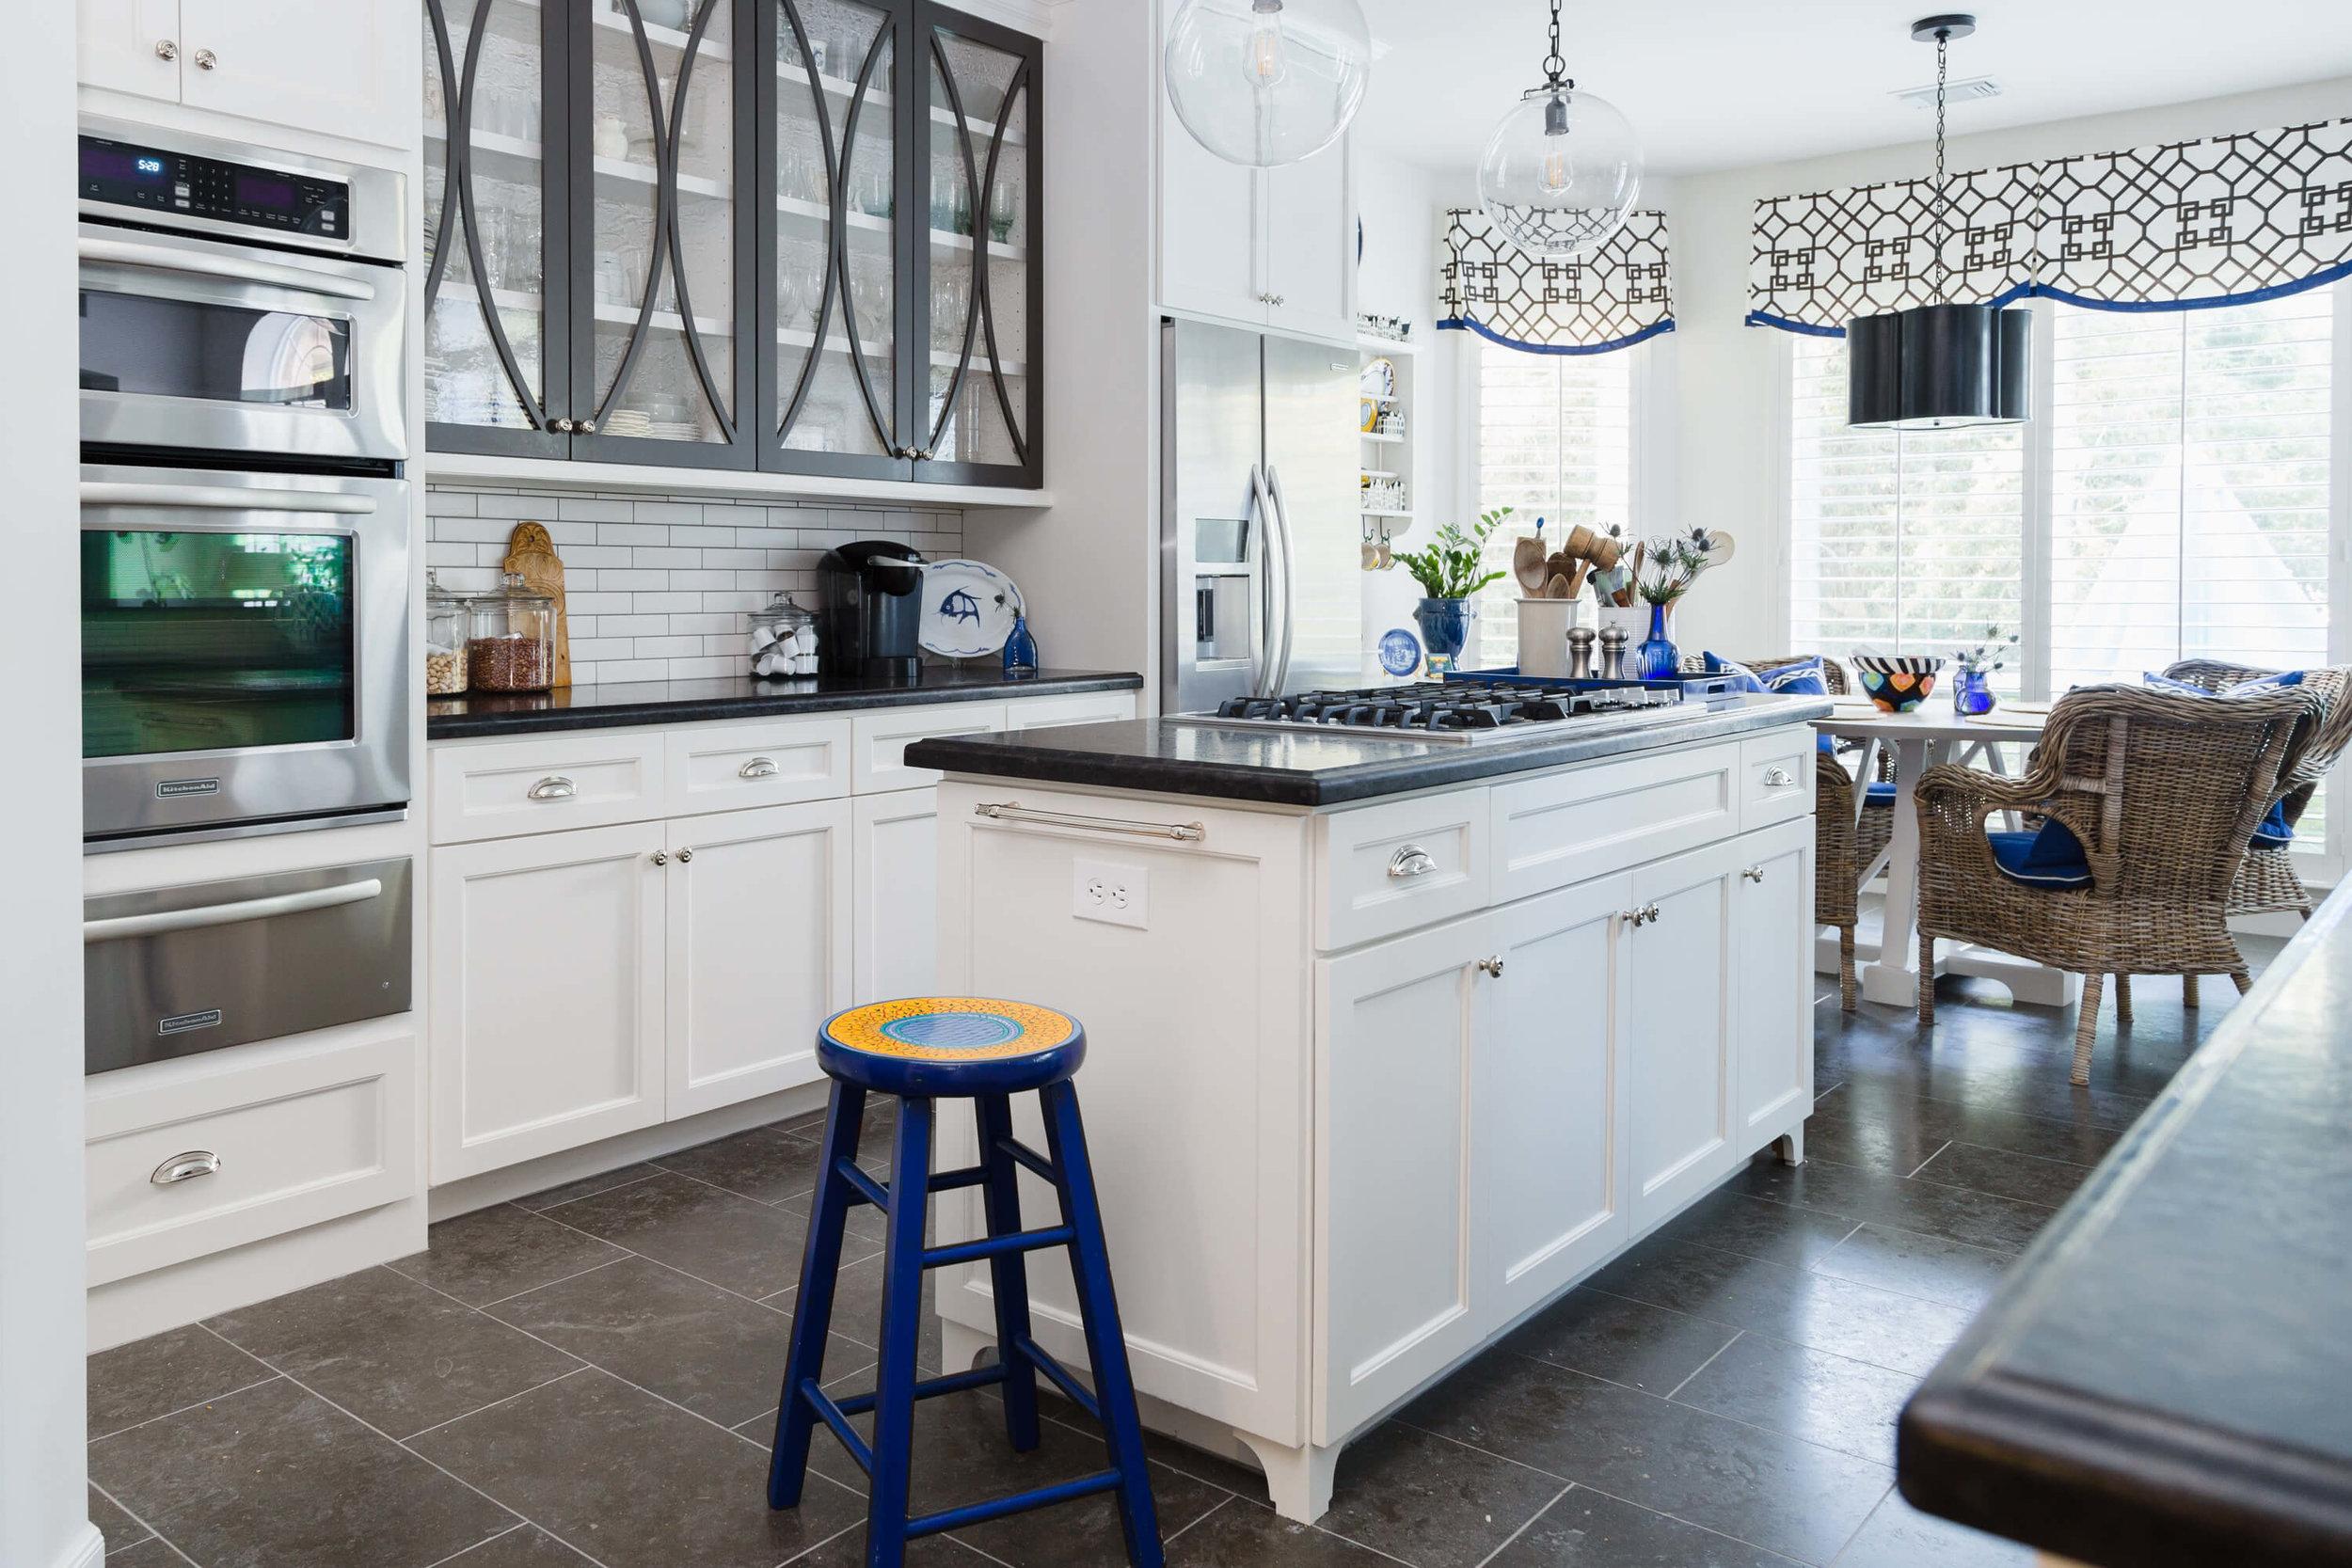 My kitchen remodel - Carla Aston Designer, Tori Aston Photographer